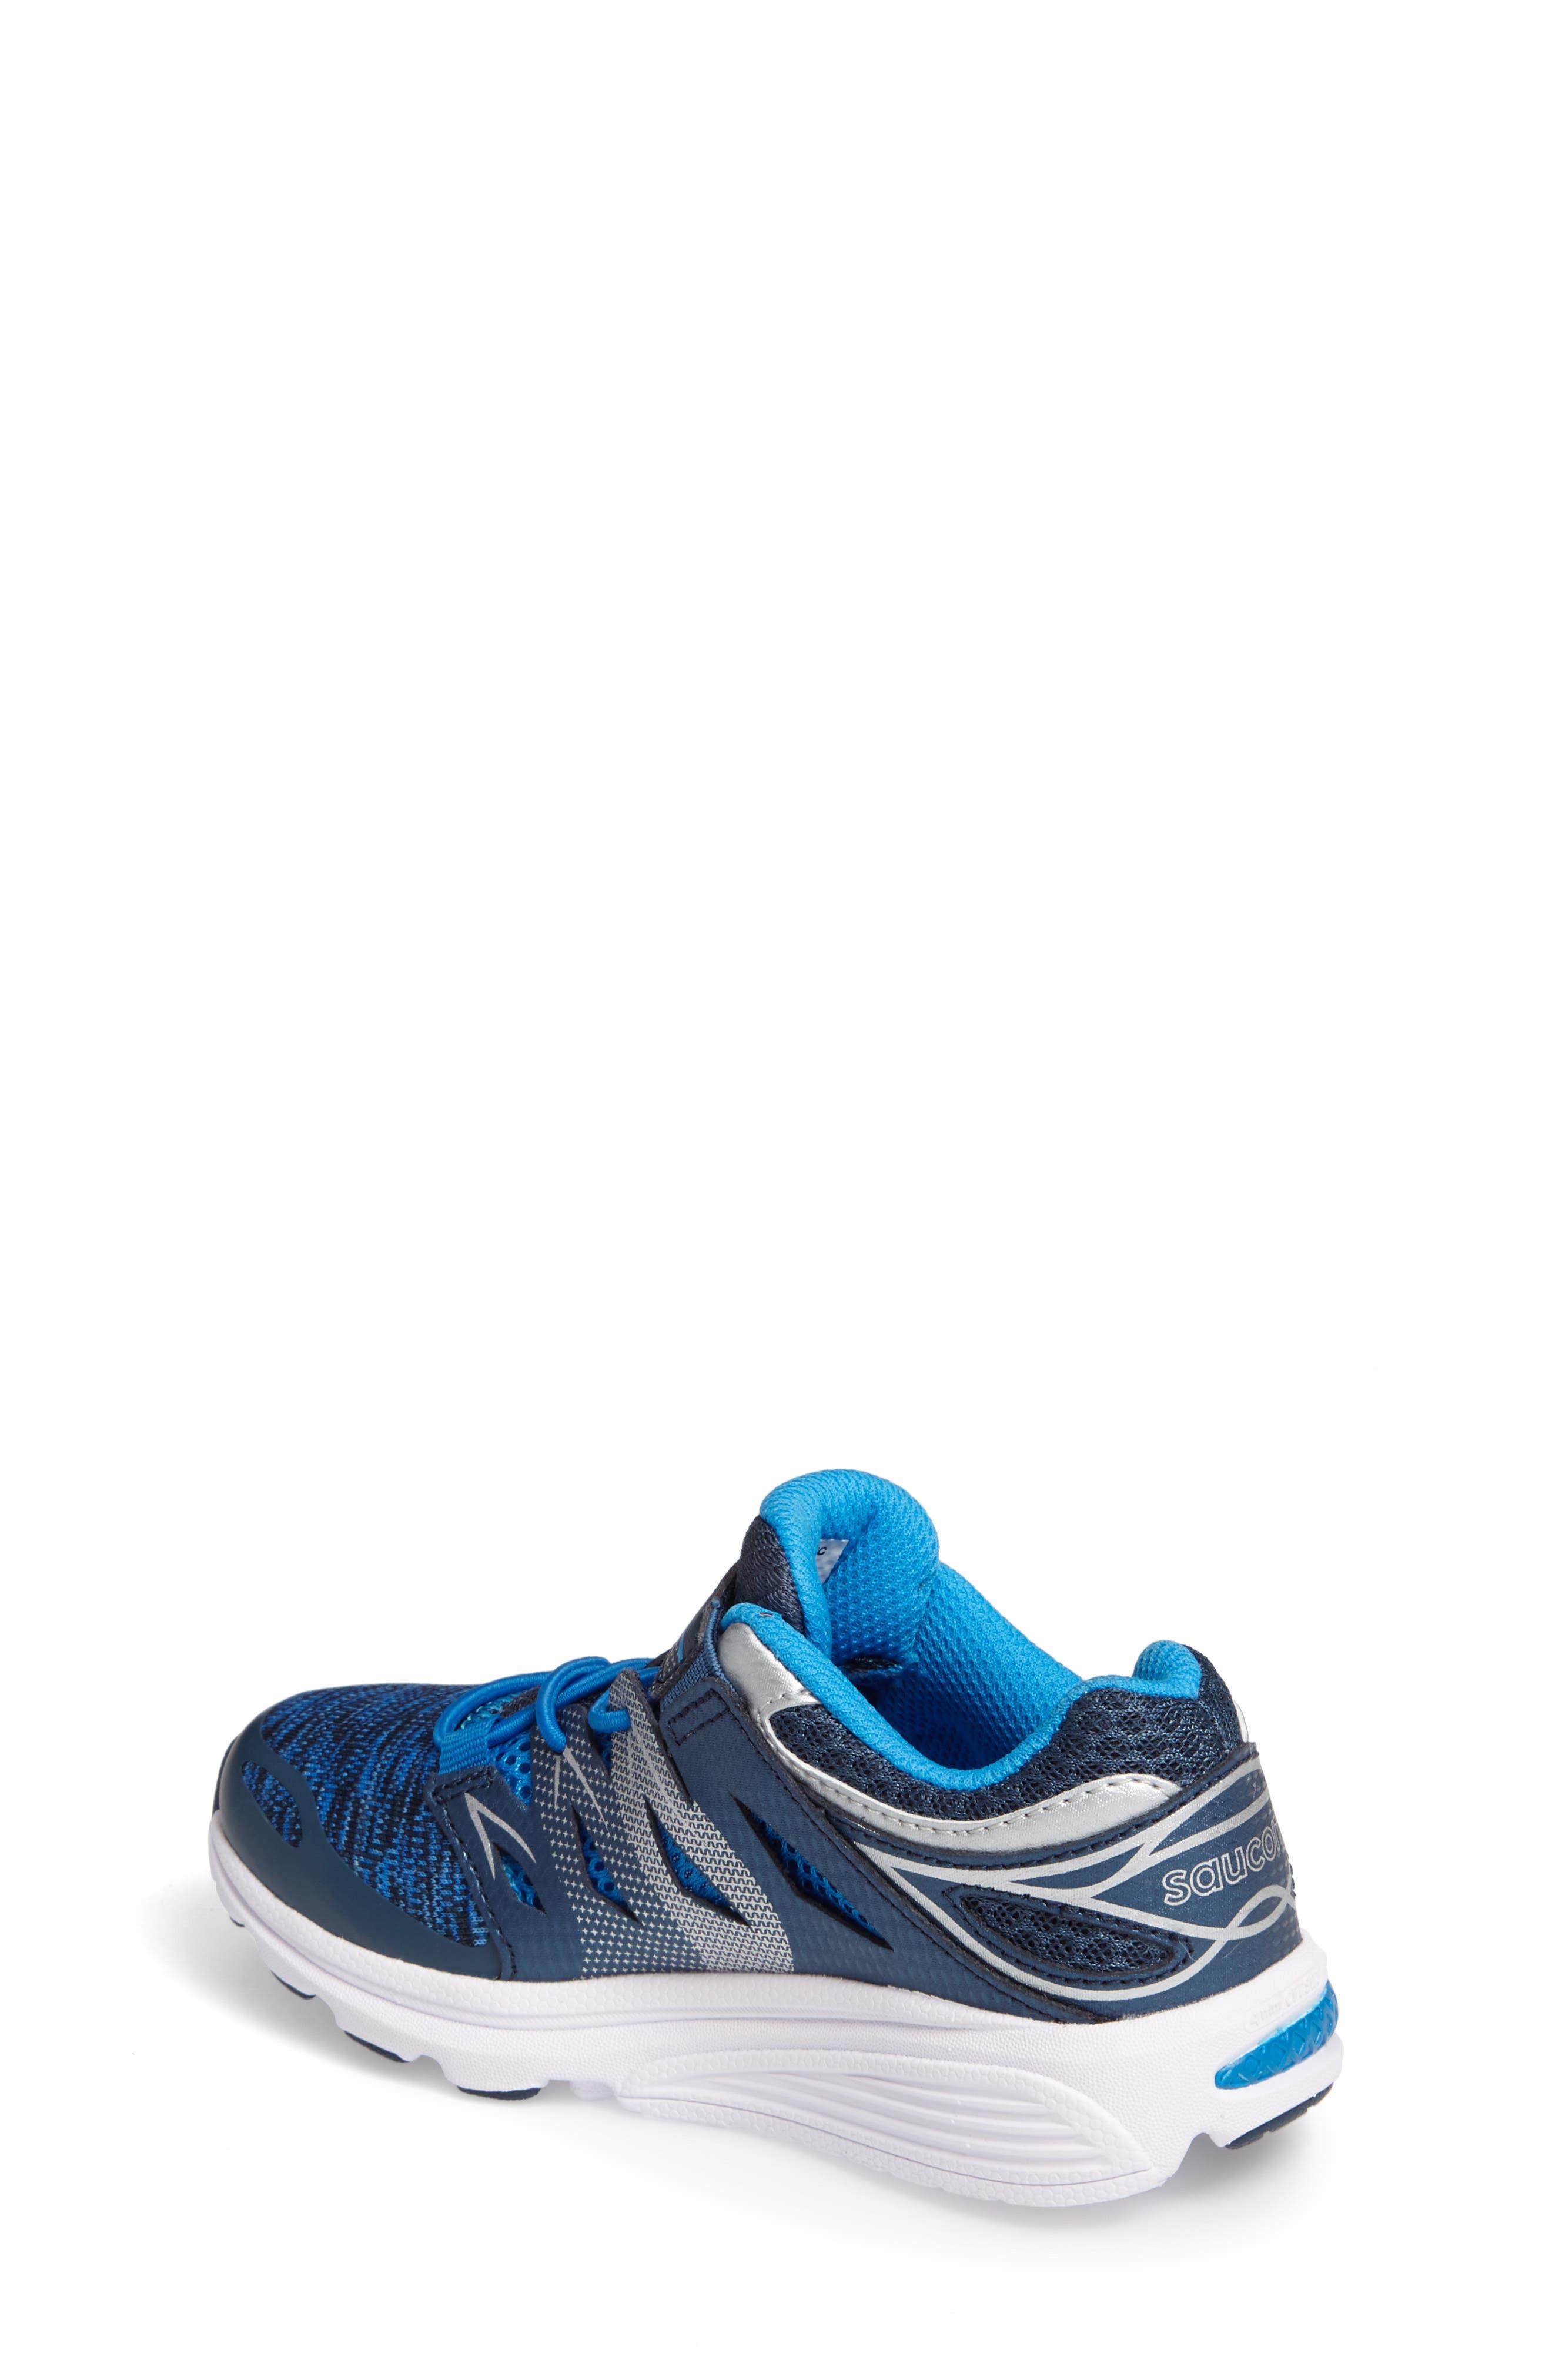 Zealot 2 A/C Sneaker,                             Alternate thumbnail 2, color,                             Royal/ Navy